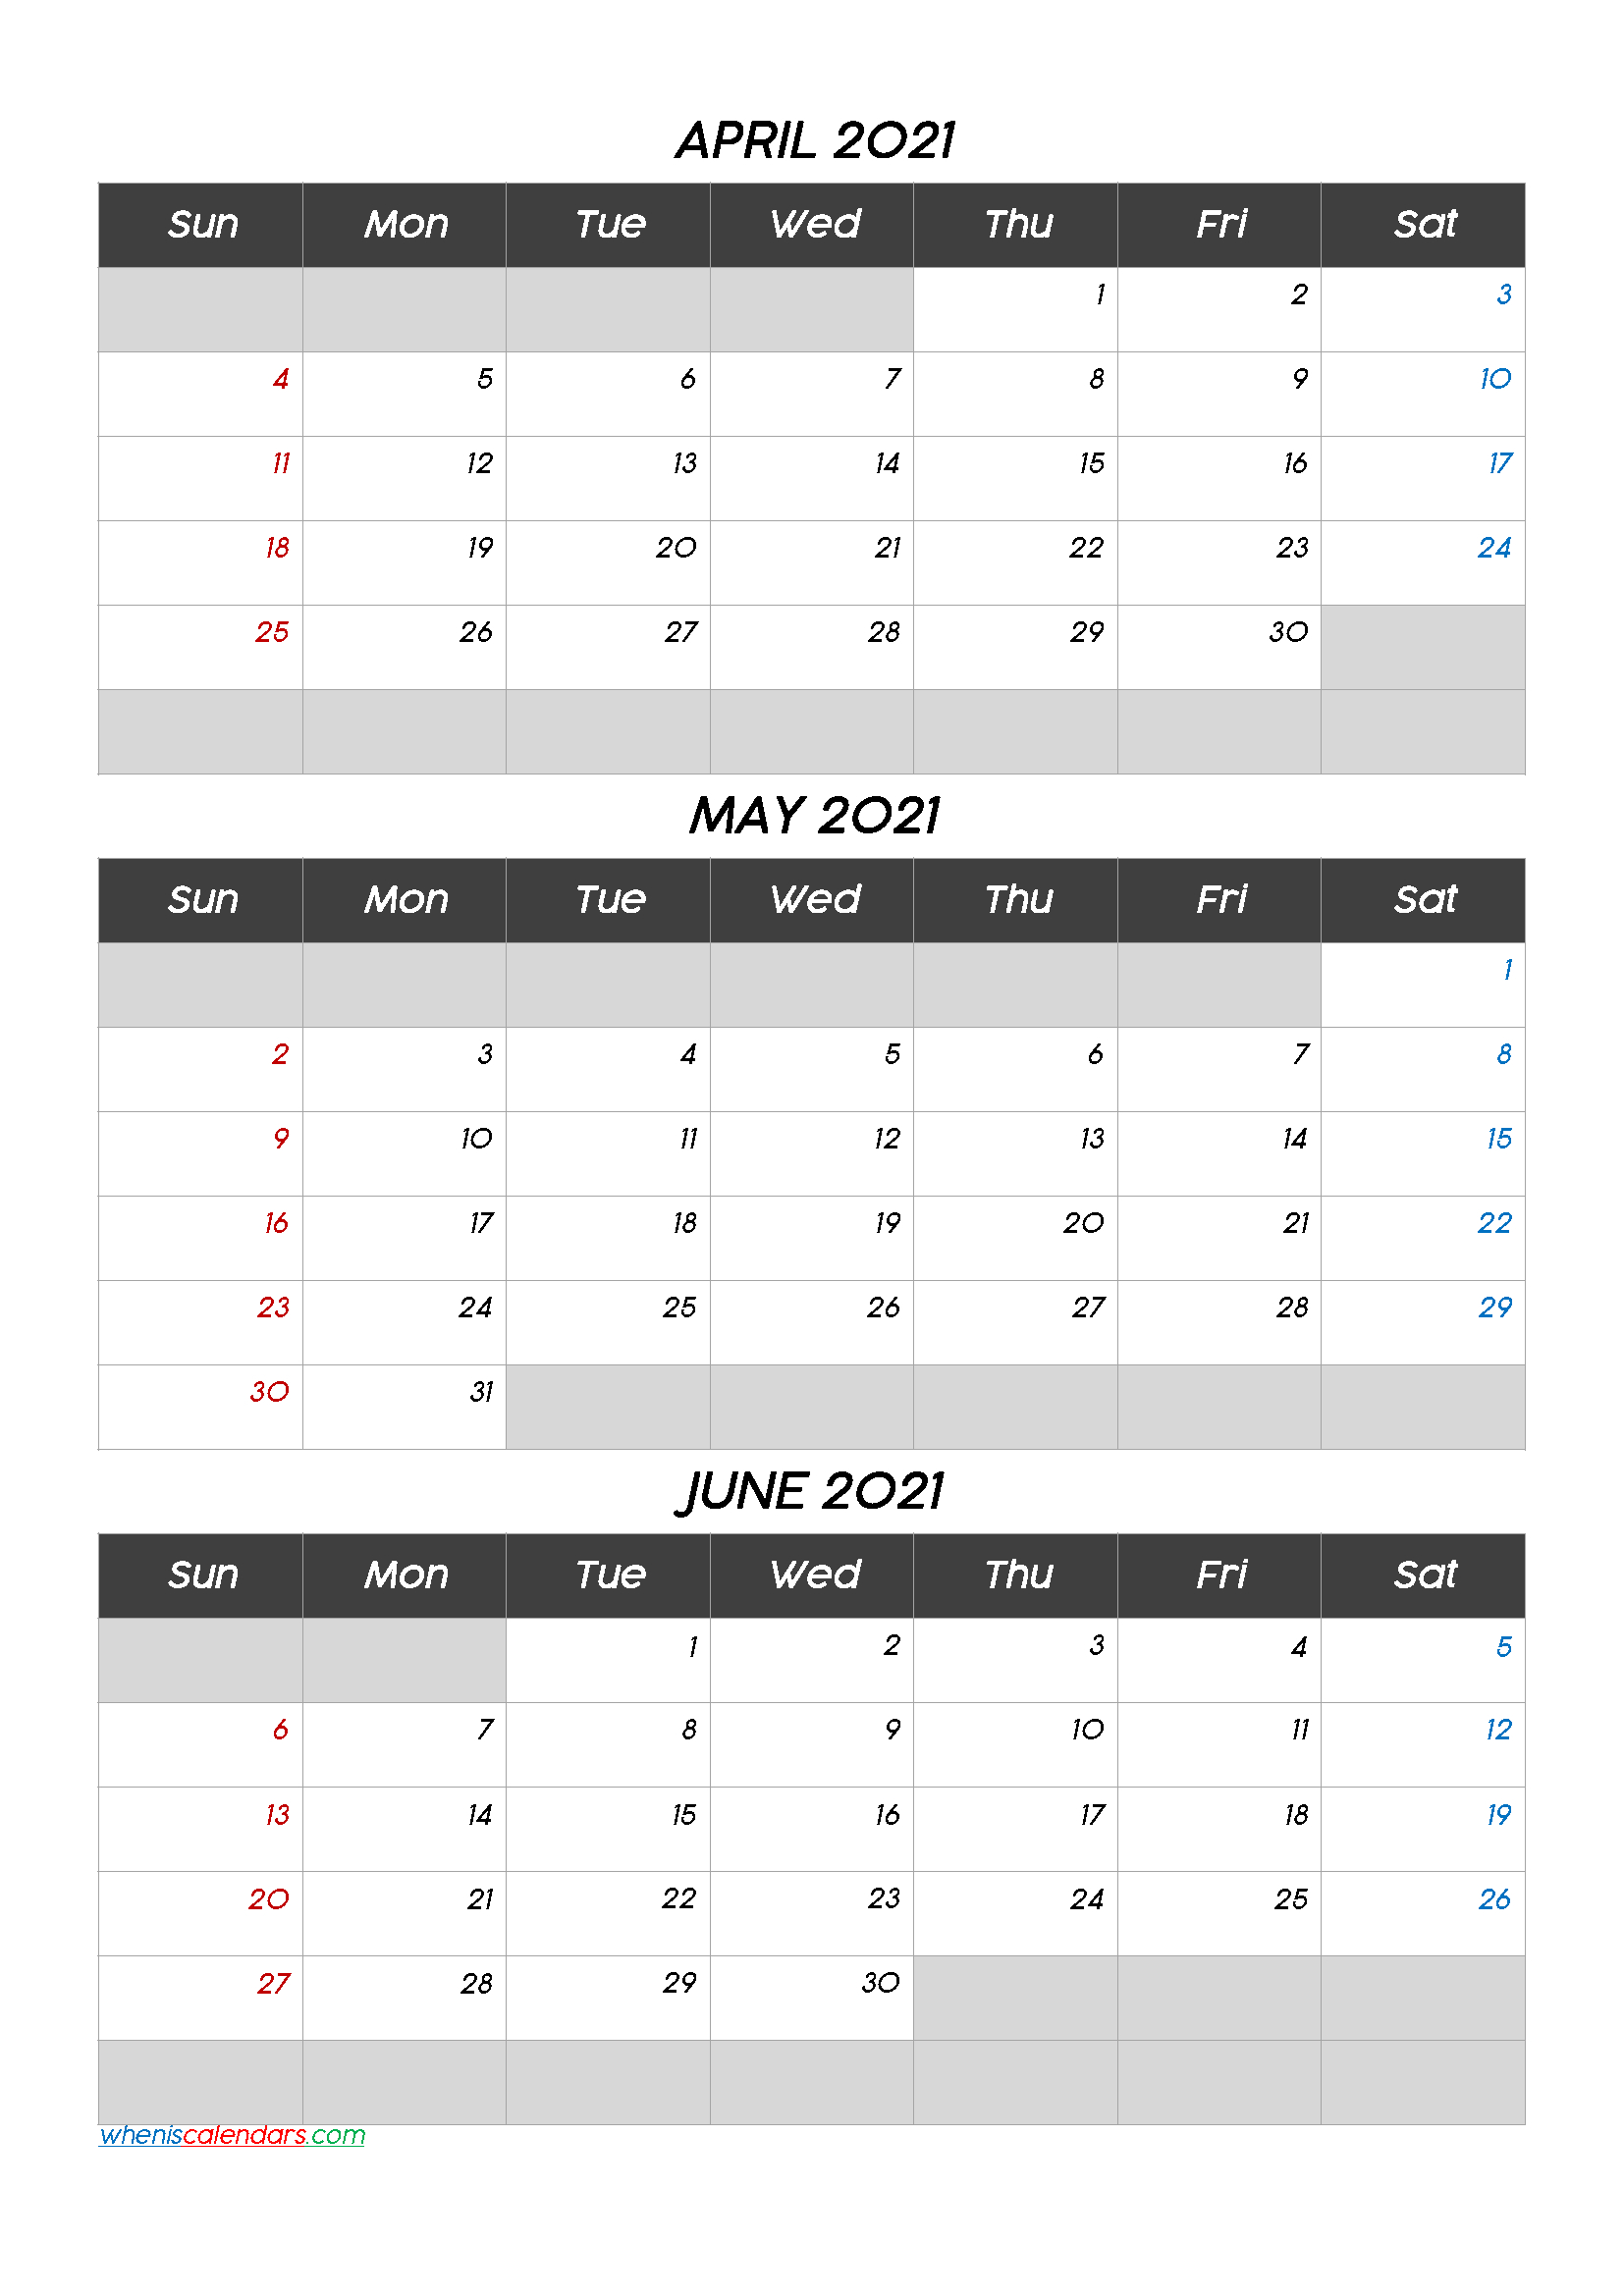 April May June 2021 Printable Calendar [Q1Q2Q3Q4] regarding Blank Printable Calendars 3 Month 2021